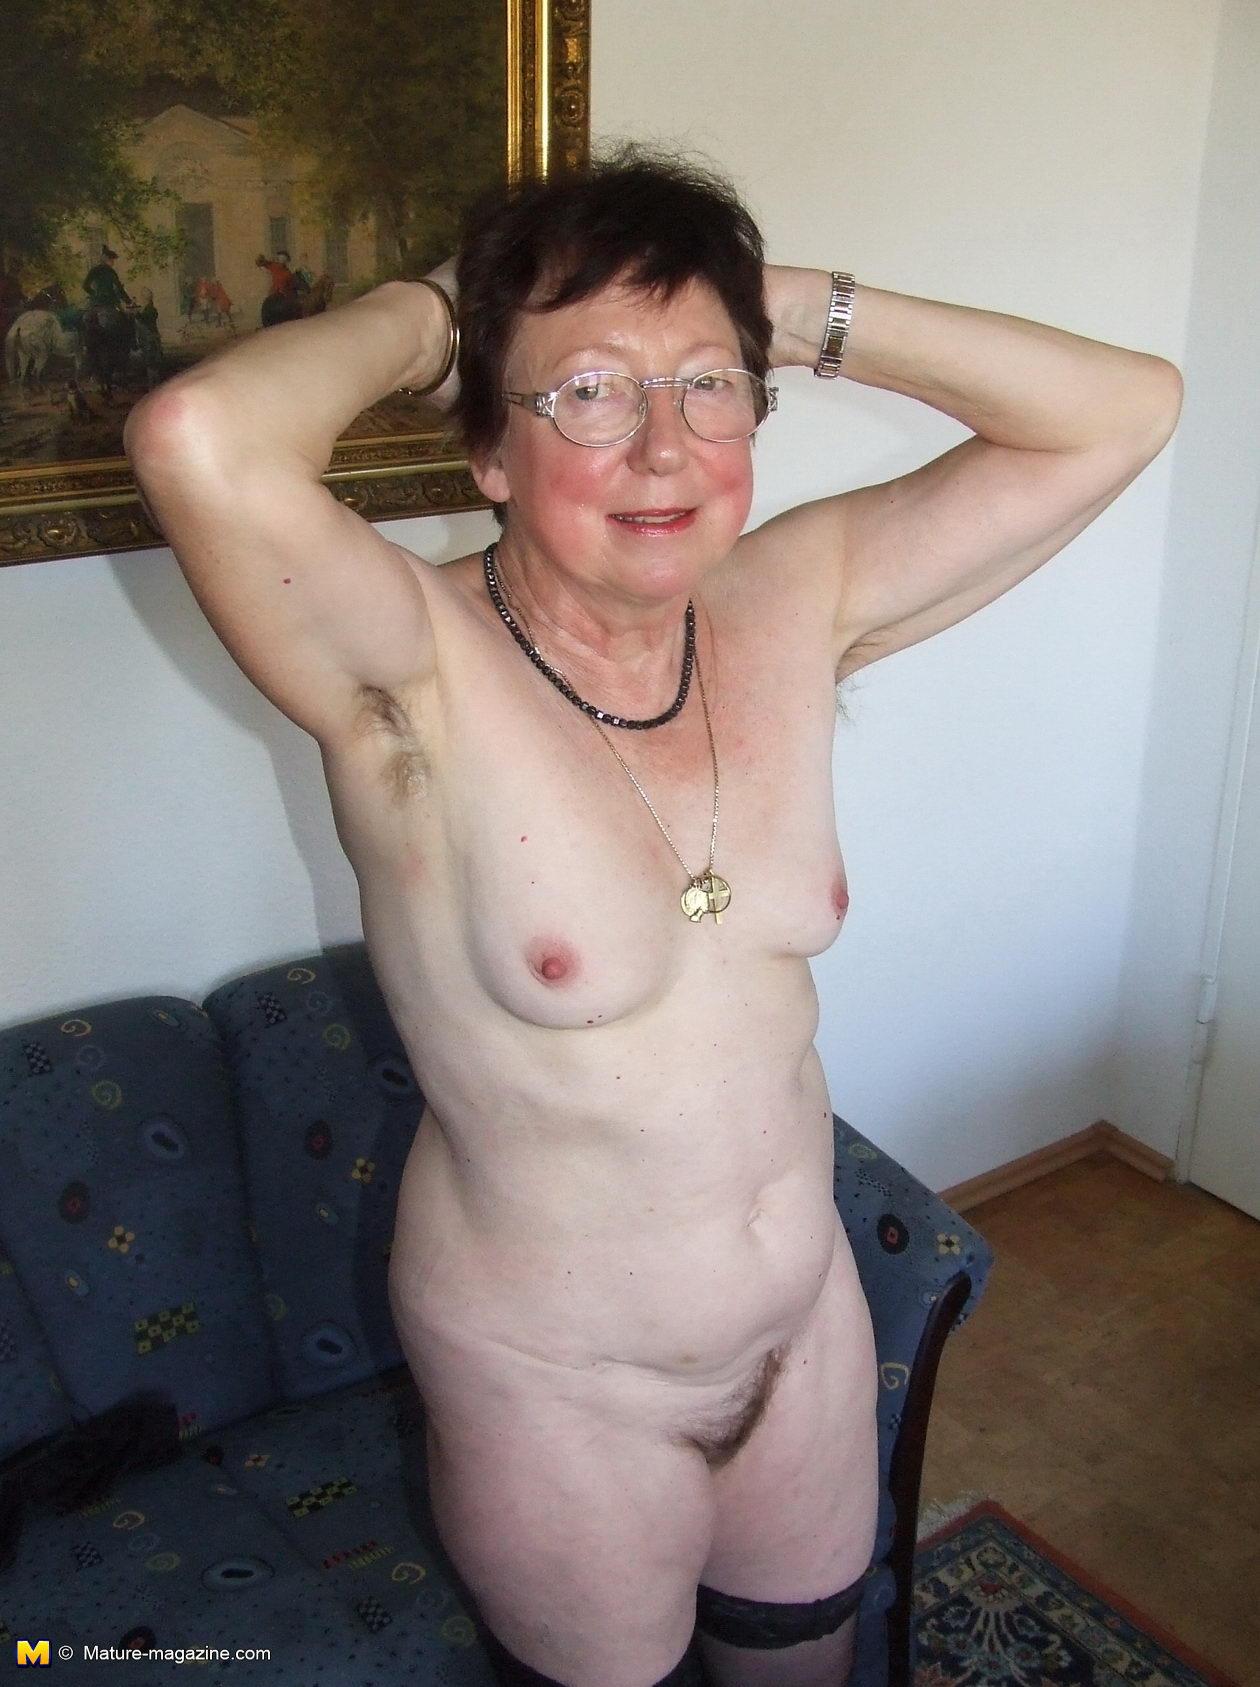 nude amateur girl having incredible orgasm